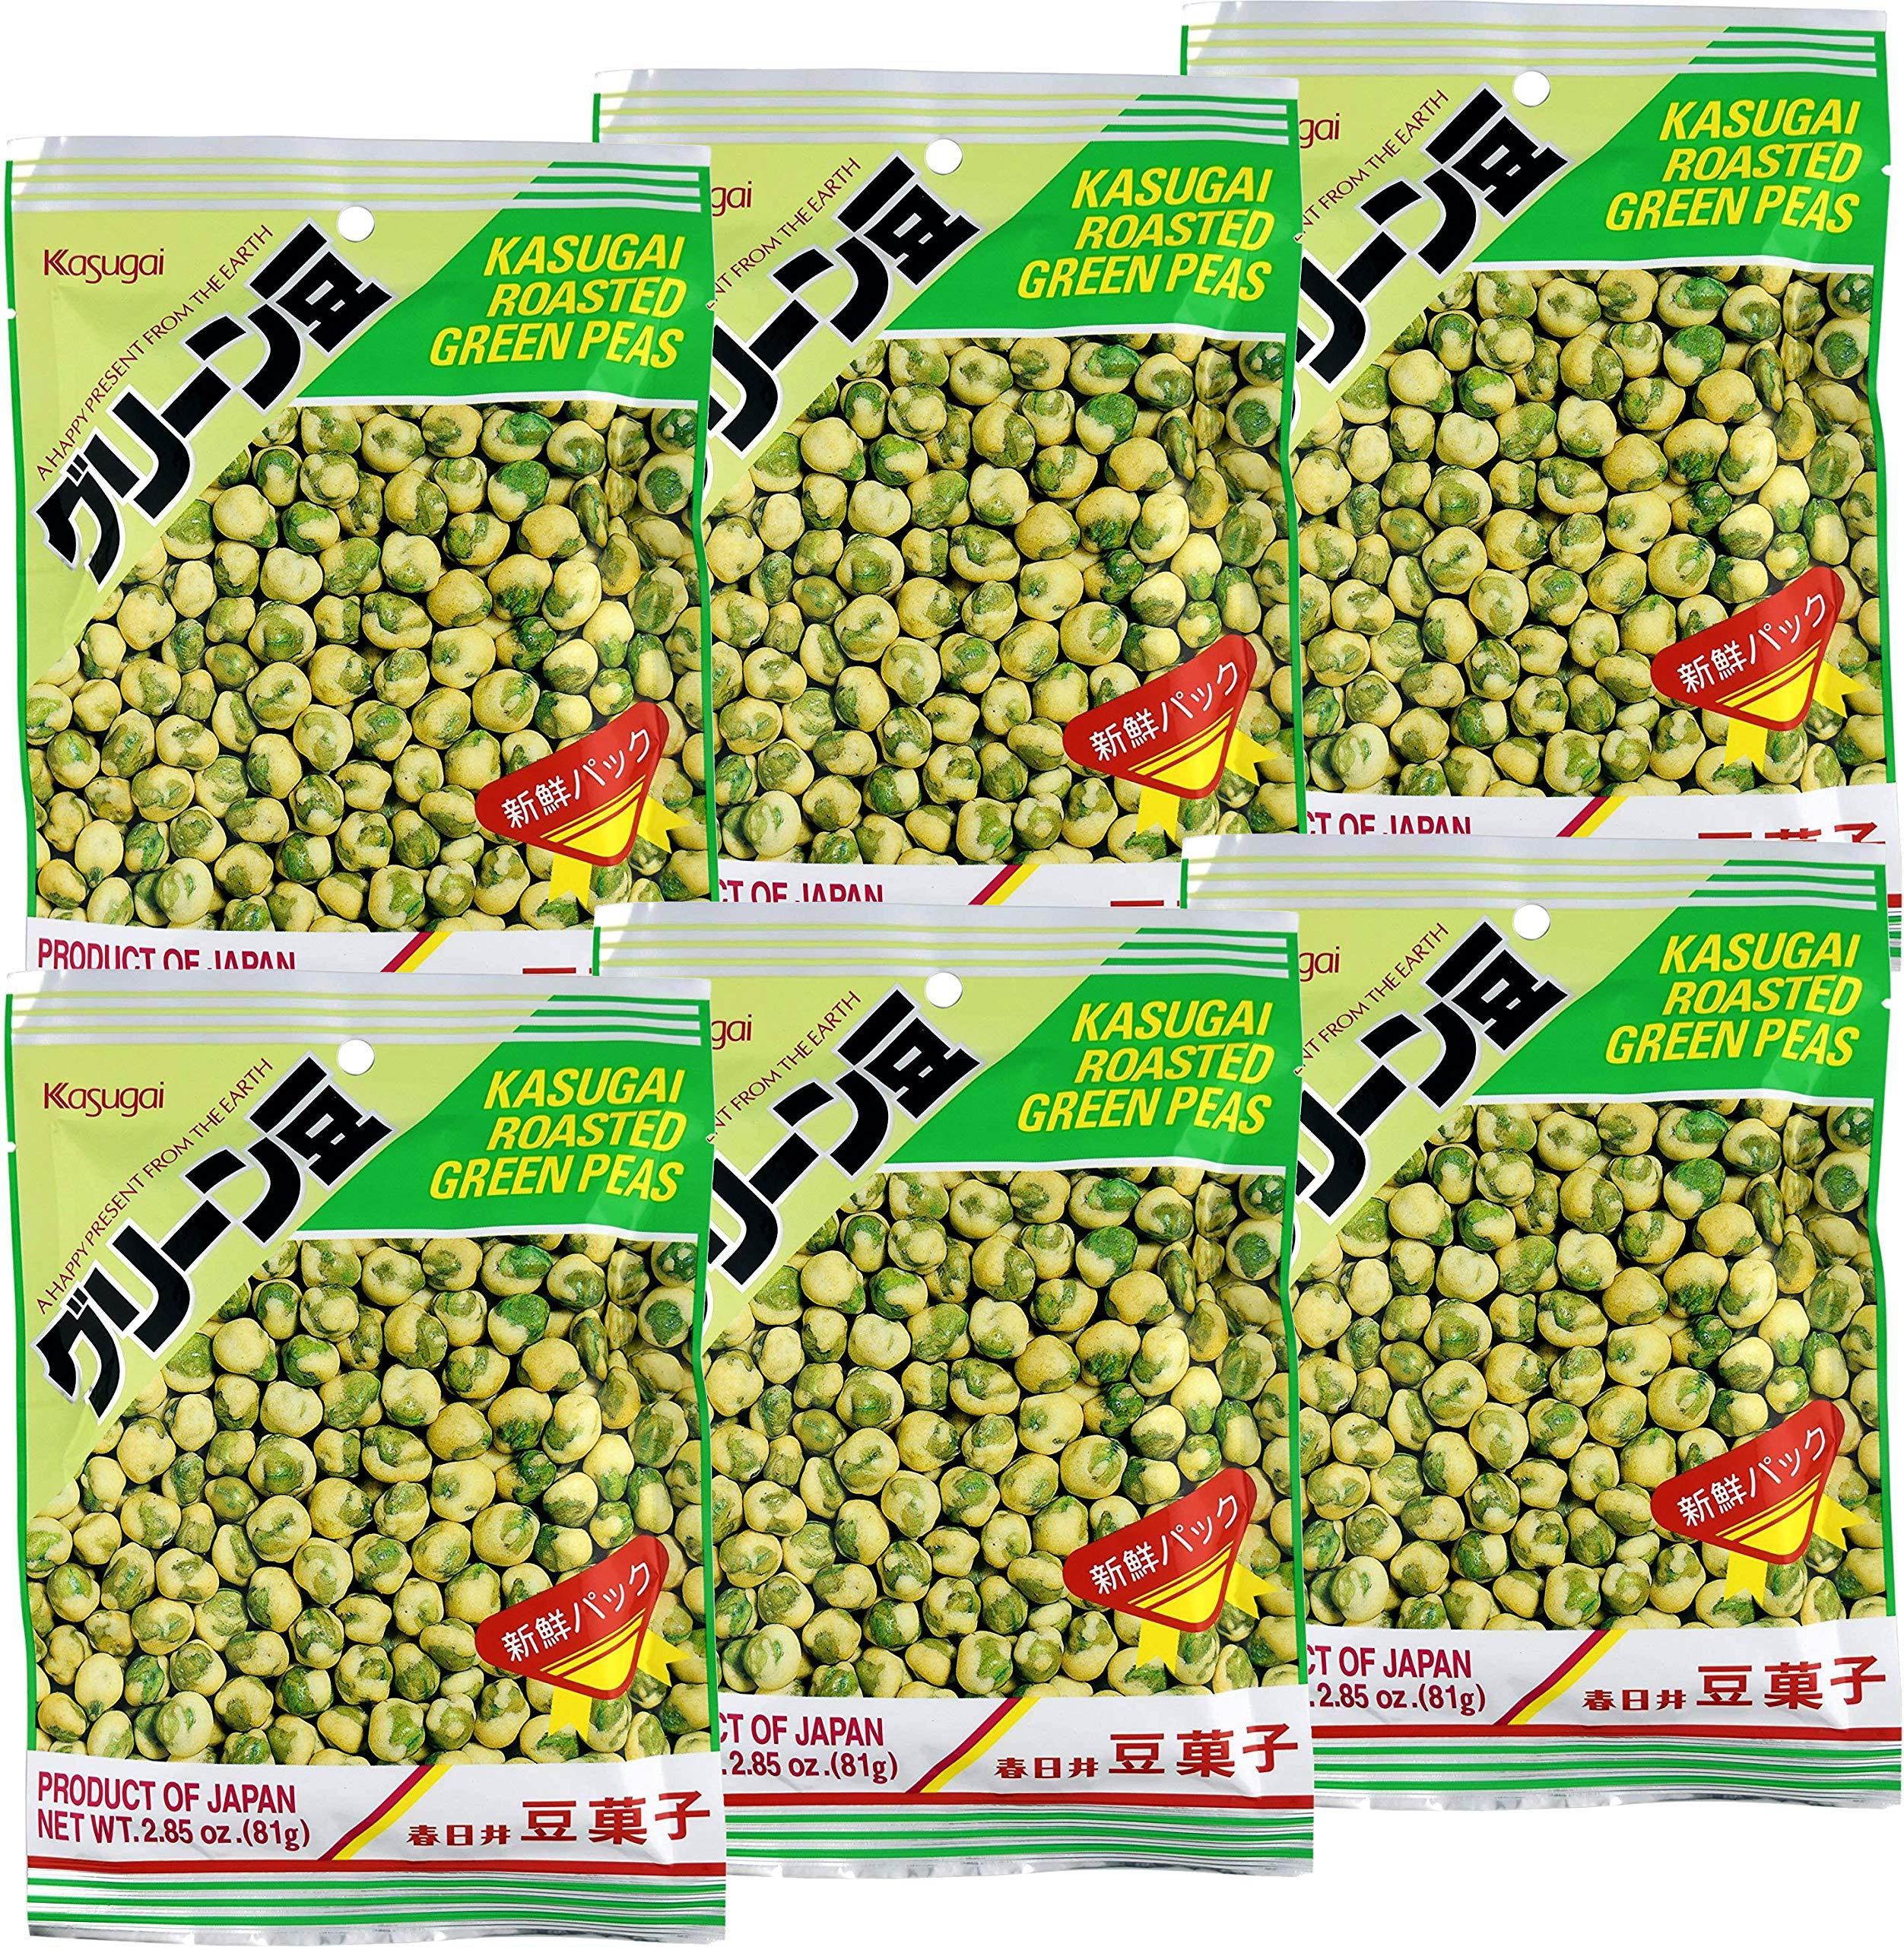 Roasted Green Peas - 3.35oz [Pack of 6] by Kasugai